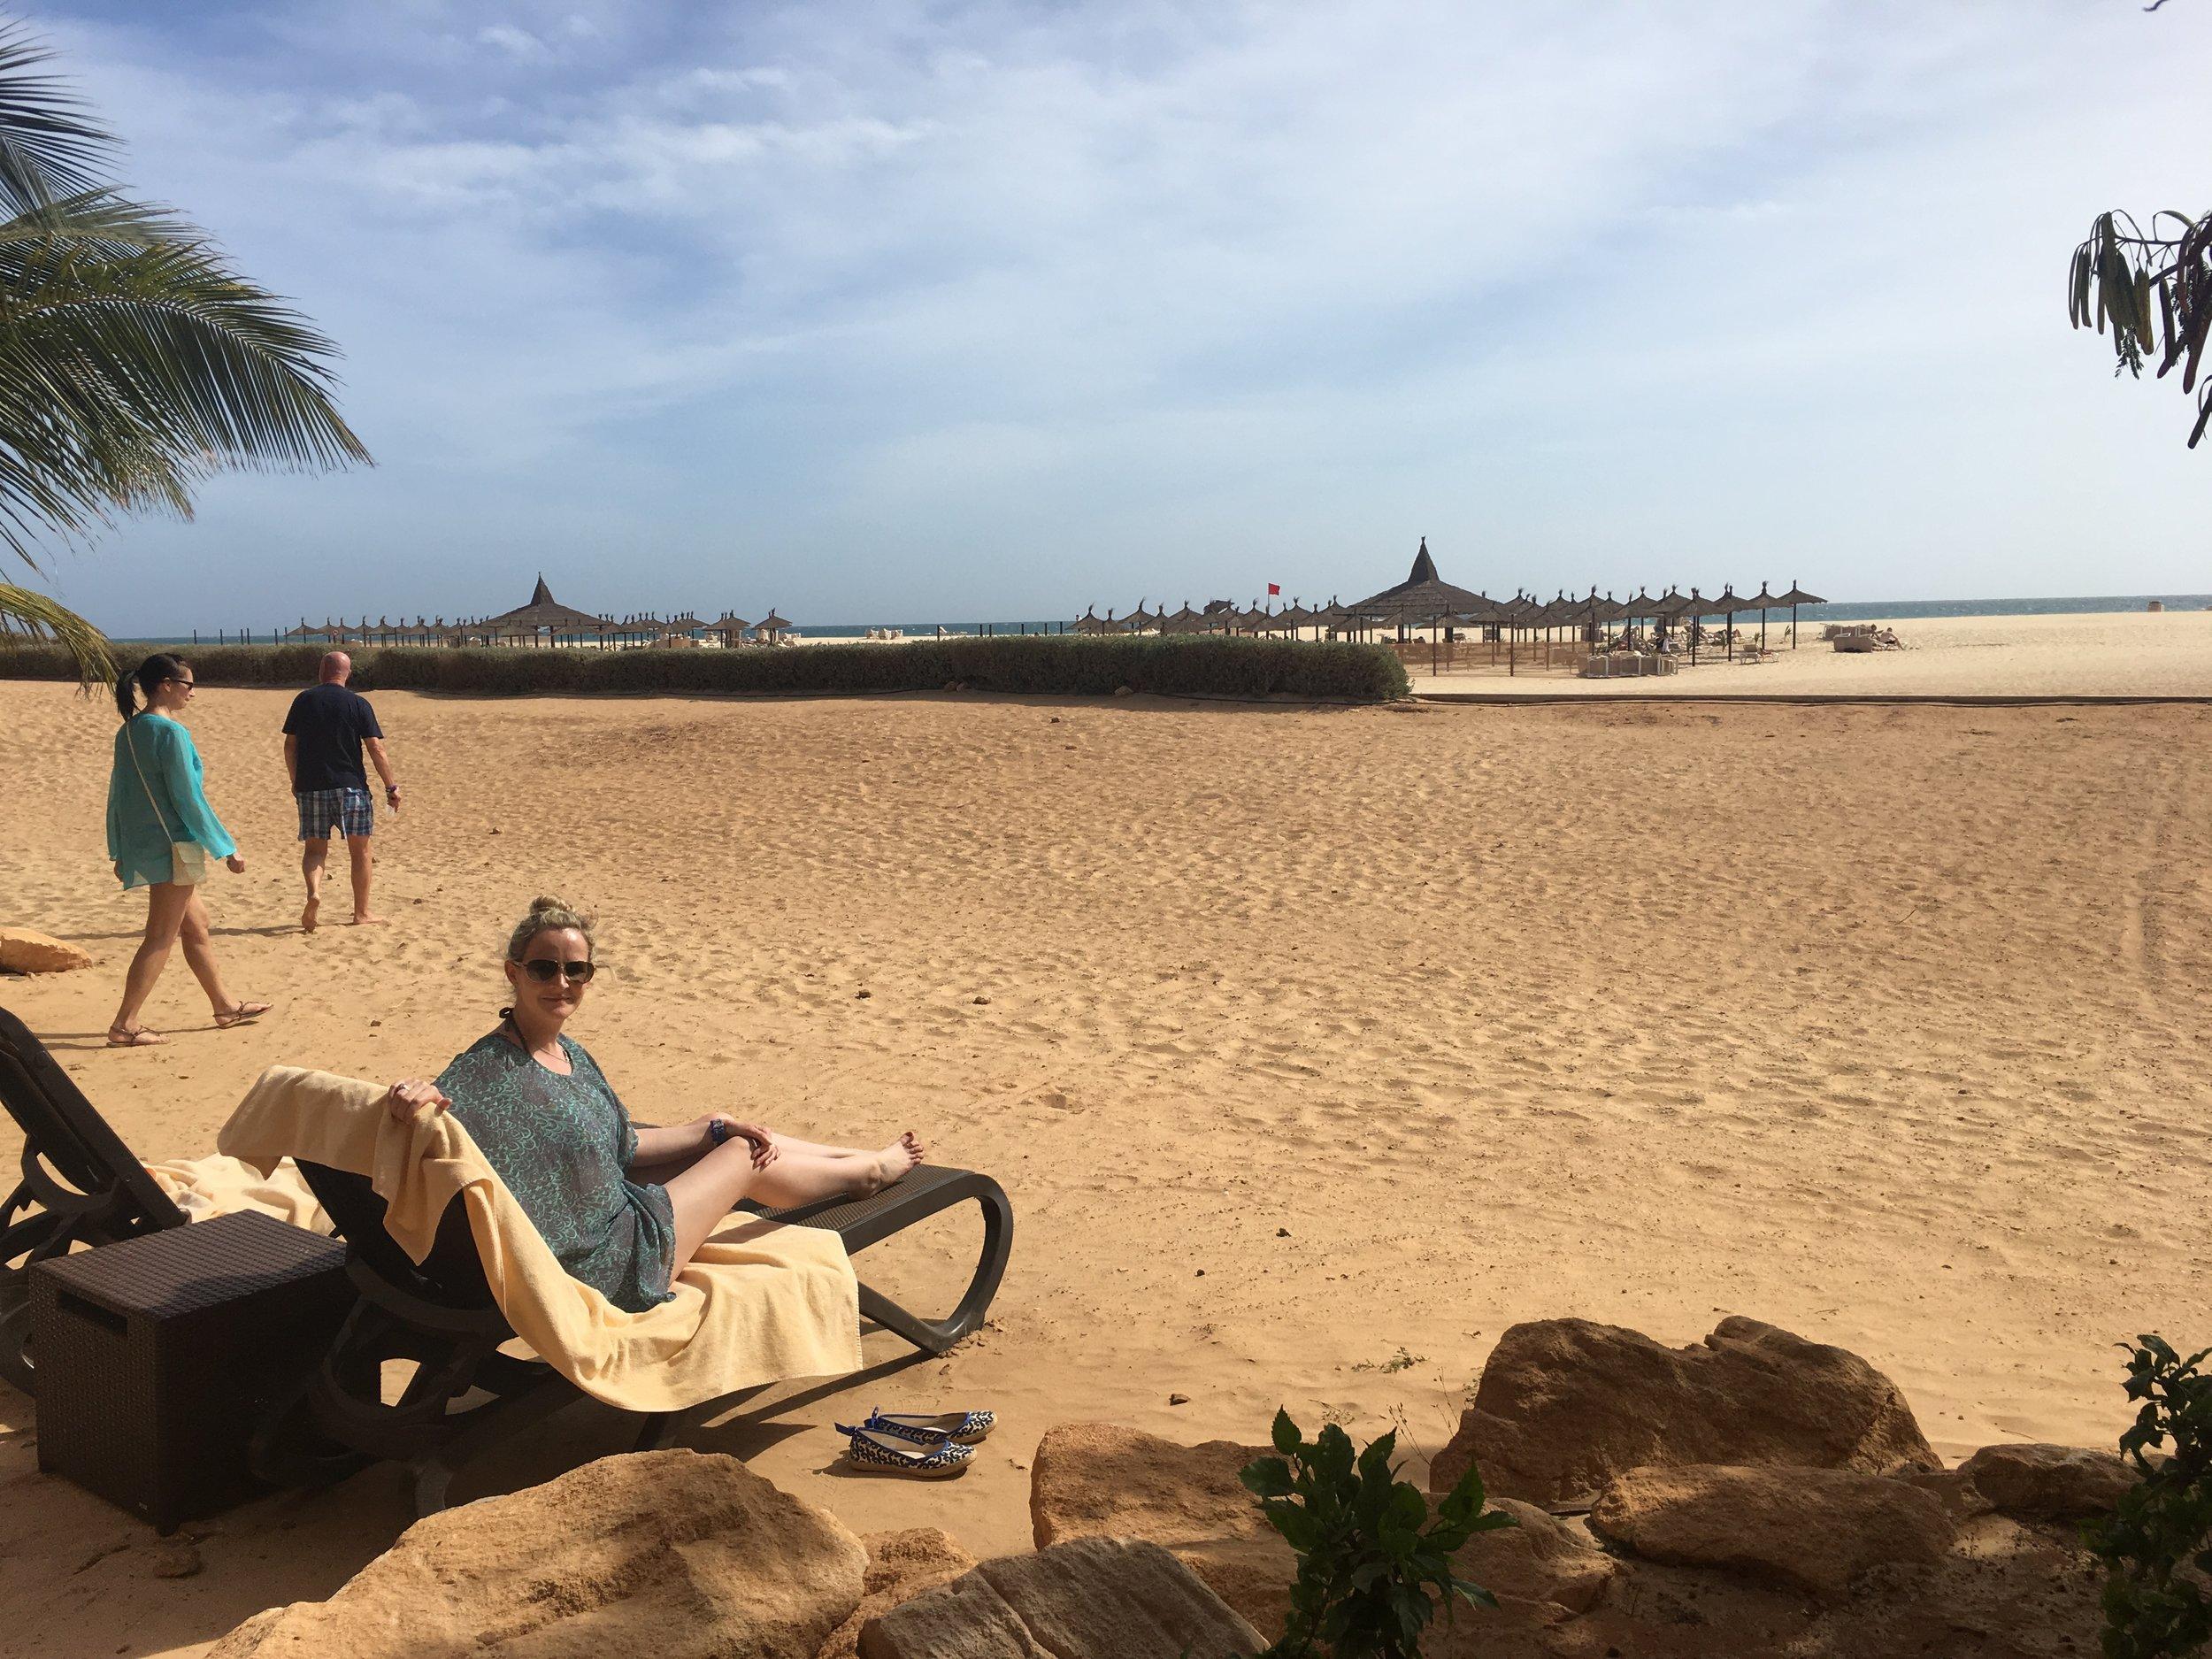 Outside the Riu Touareg Hotel Spa, overlooking the beach